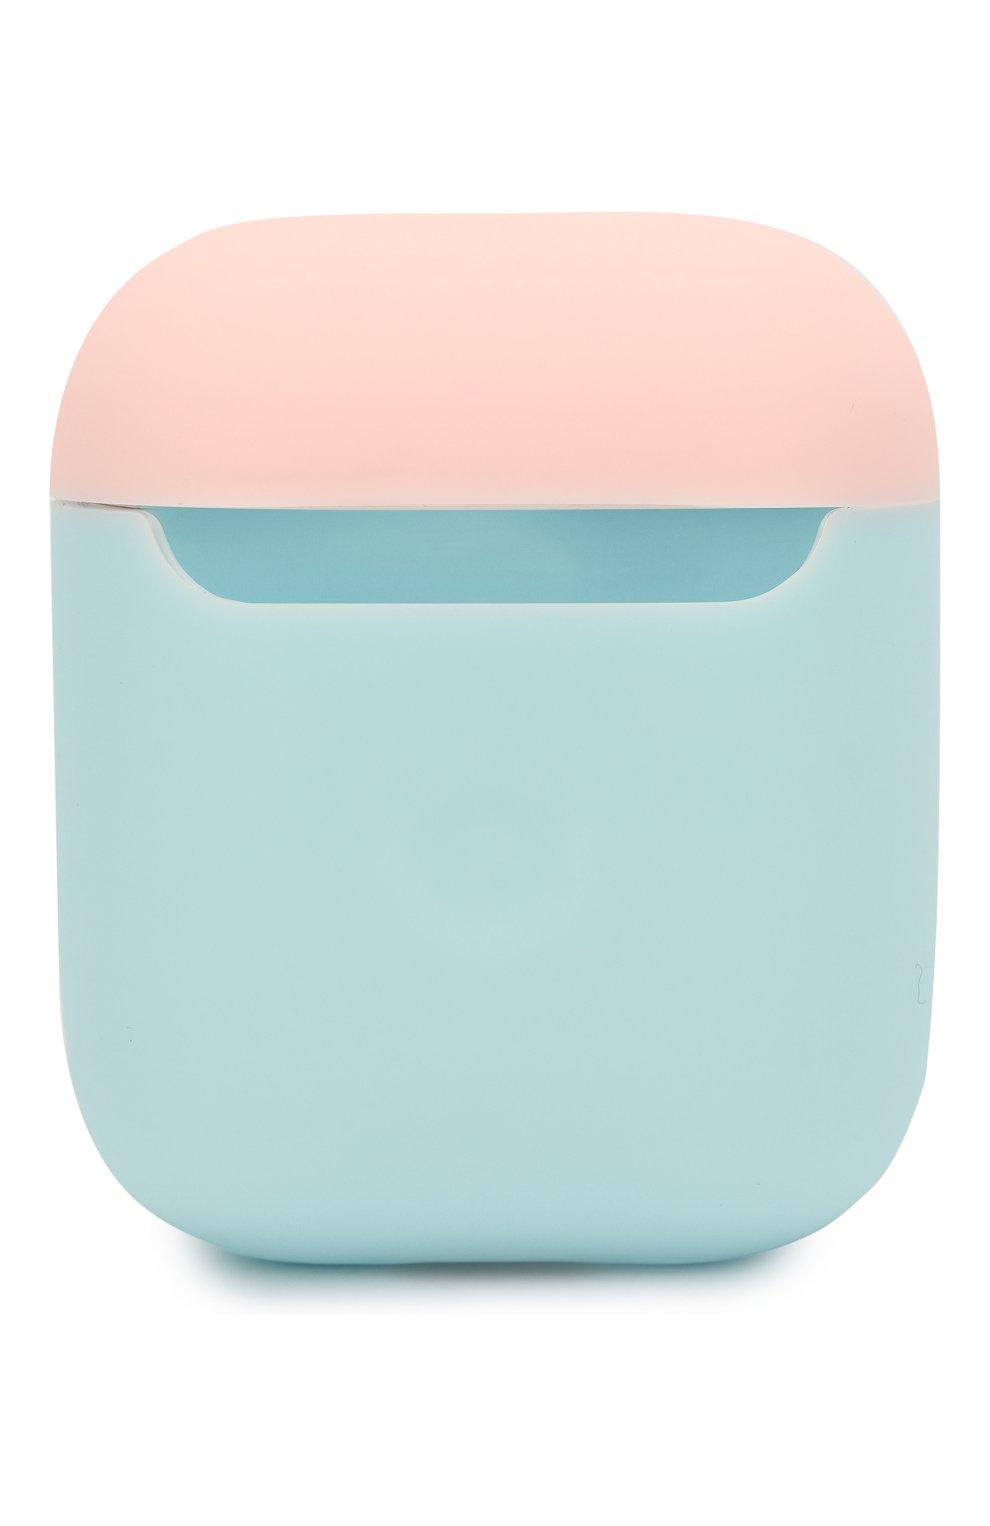 Чехол для airpods wireless ELAGO голубого цвета, арт. EAP2DO-PBL-PKWH | Фото 9 (Статус проверки: Проверена категория)